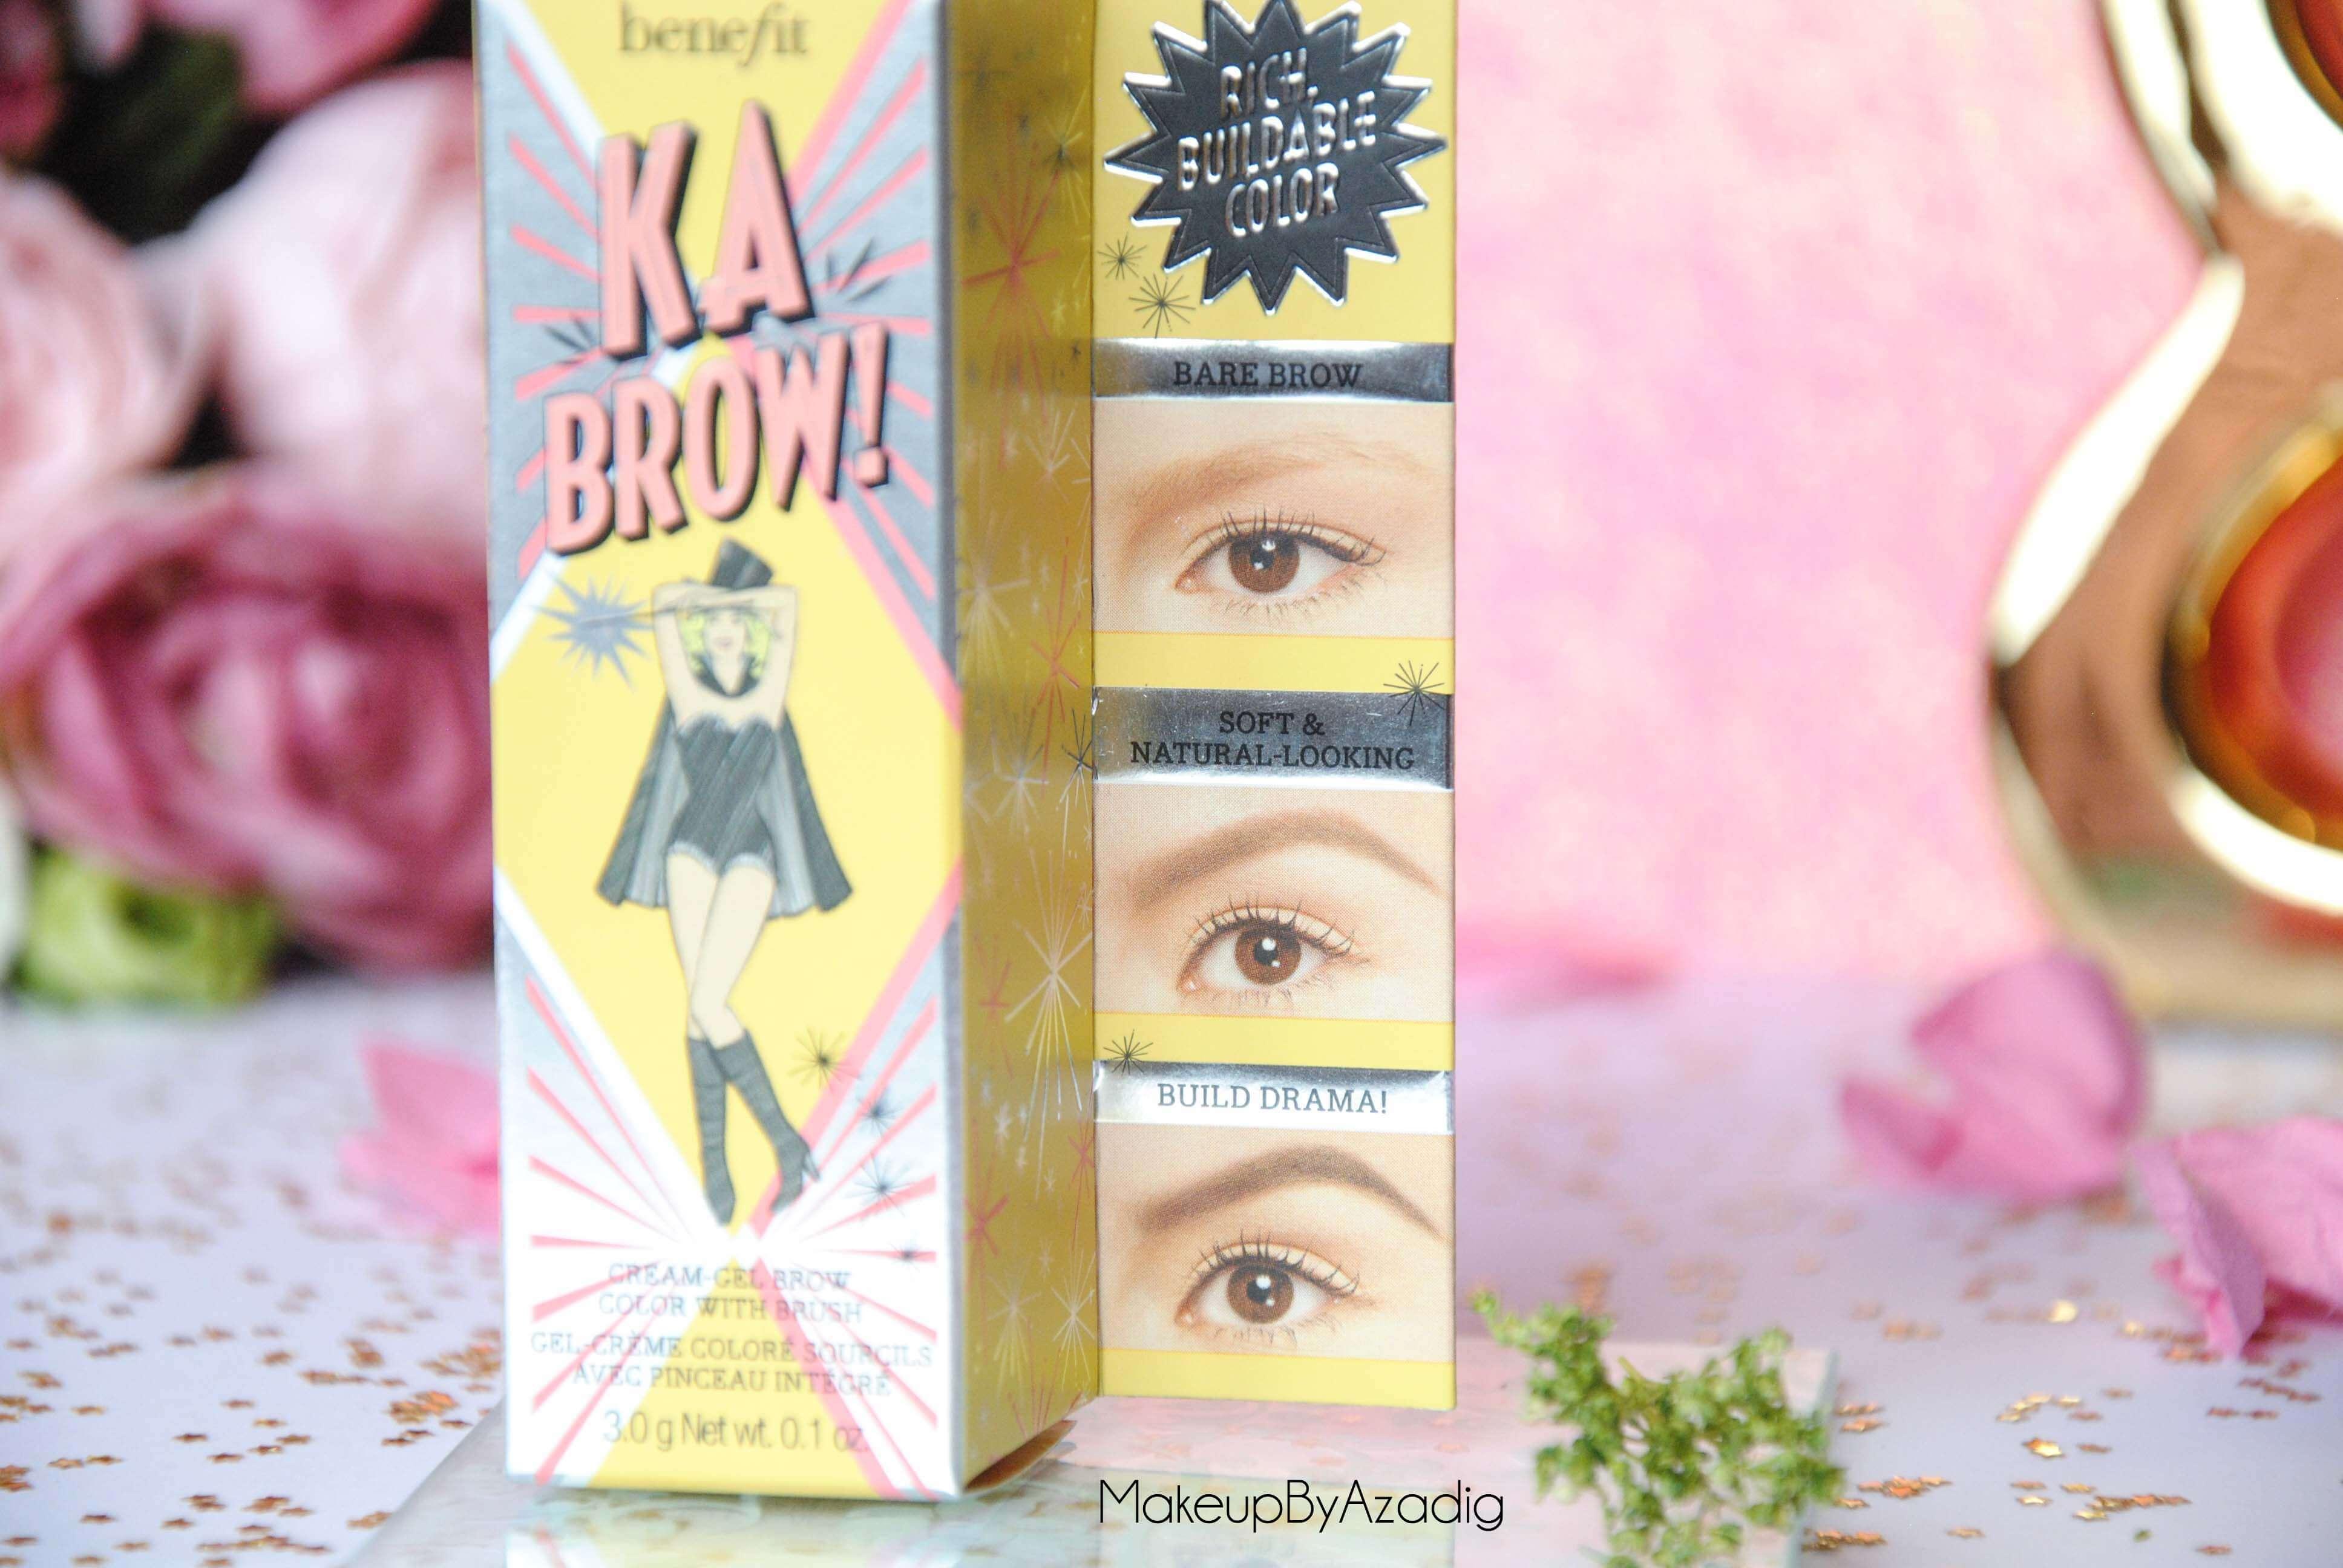 ka-brow-gel-creme-coloration-sourcils-benefit-makeupbyazadig-paris-blog-revue-avis-prix-enjoyphoenix-naturel